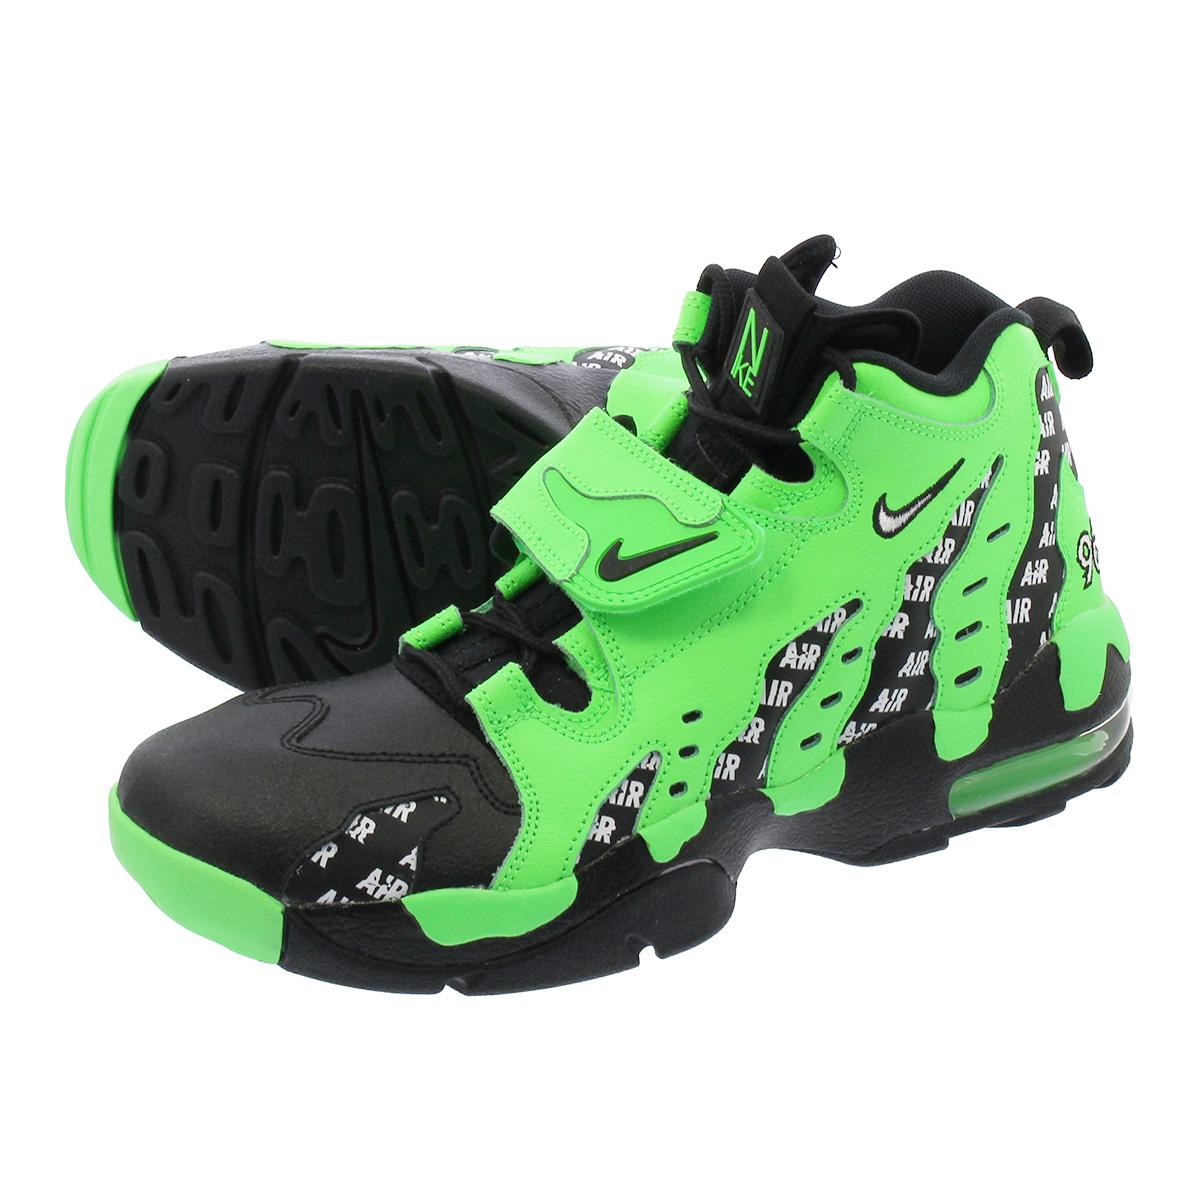 5a9459f32b LOWTEX PLUS: NIKE AIR DT MAX 96 SOA Nike air DT max 96 RAGE  GREEN/BLACK/WHITE aq5100-300 | Rakuten Global Market